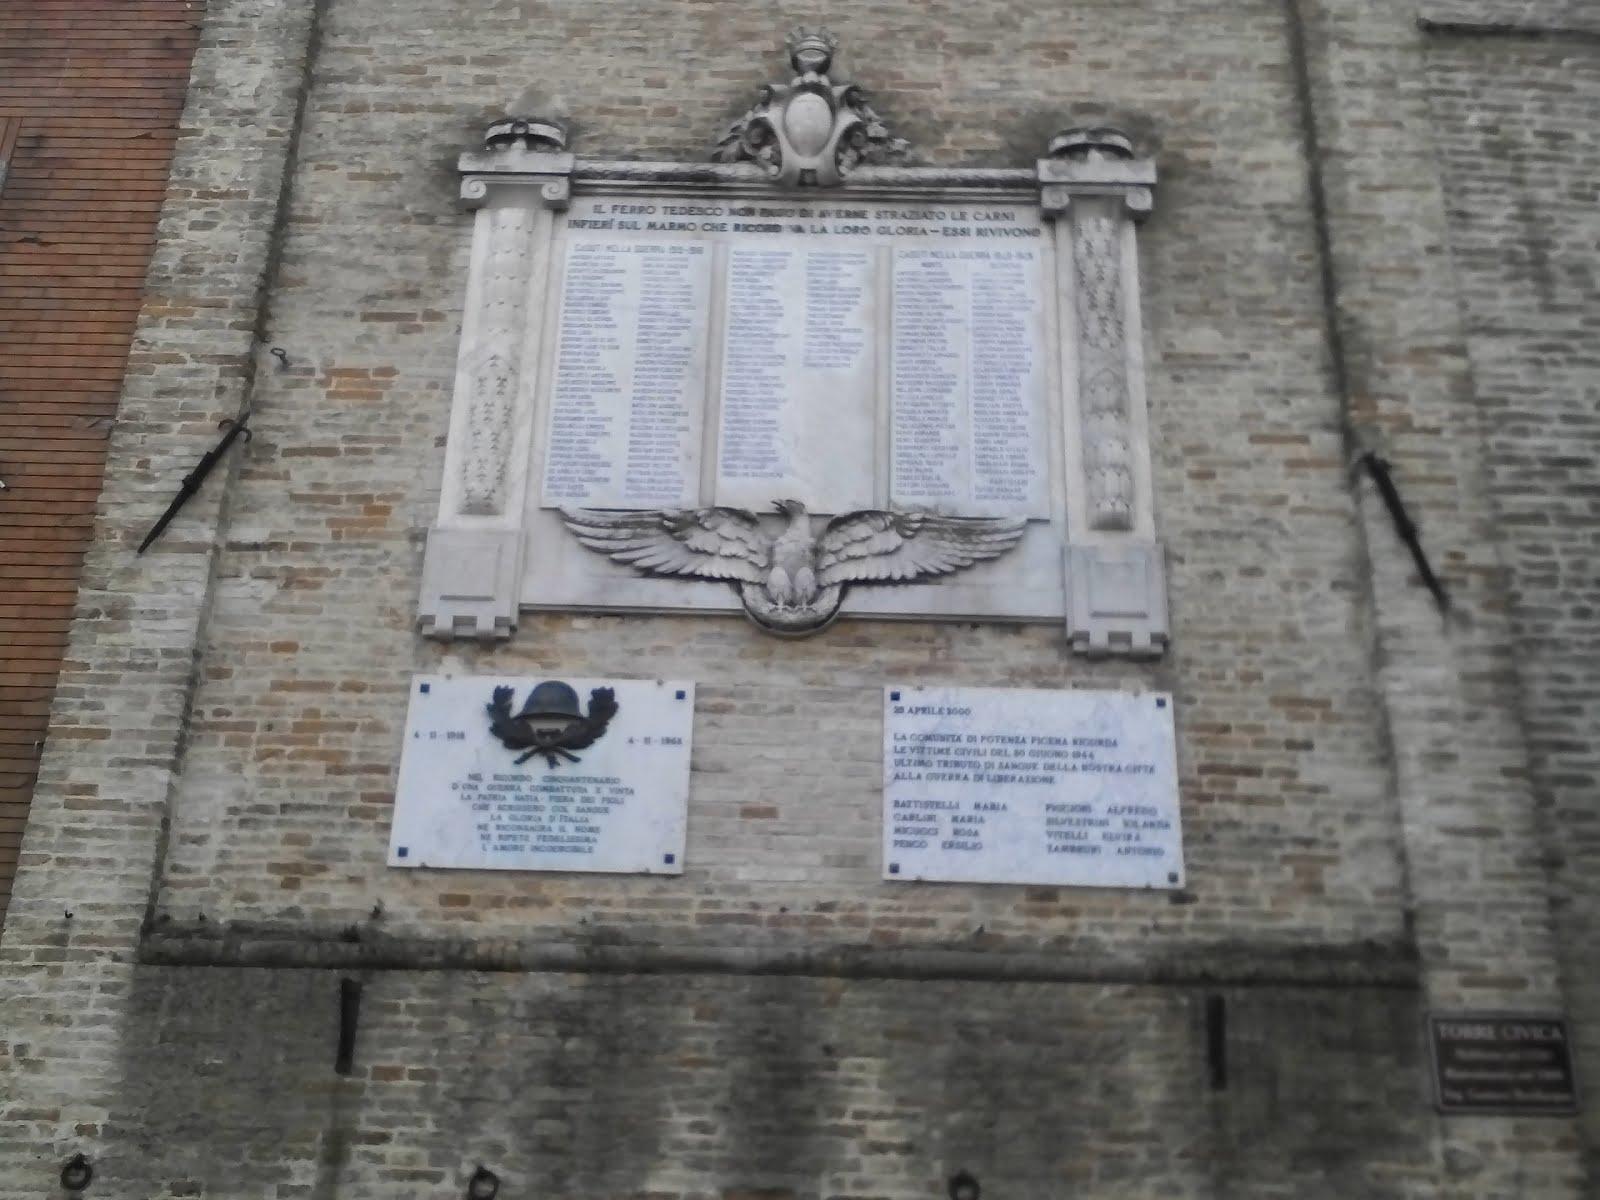 Potenza Picena 18 ottobre 2017